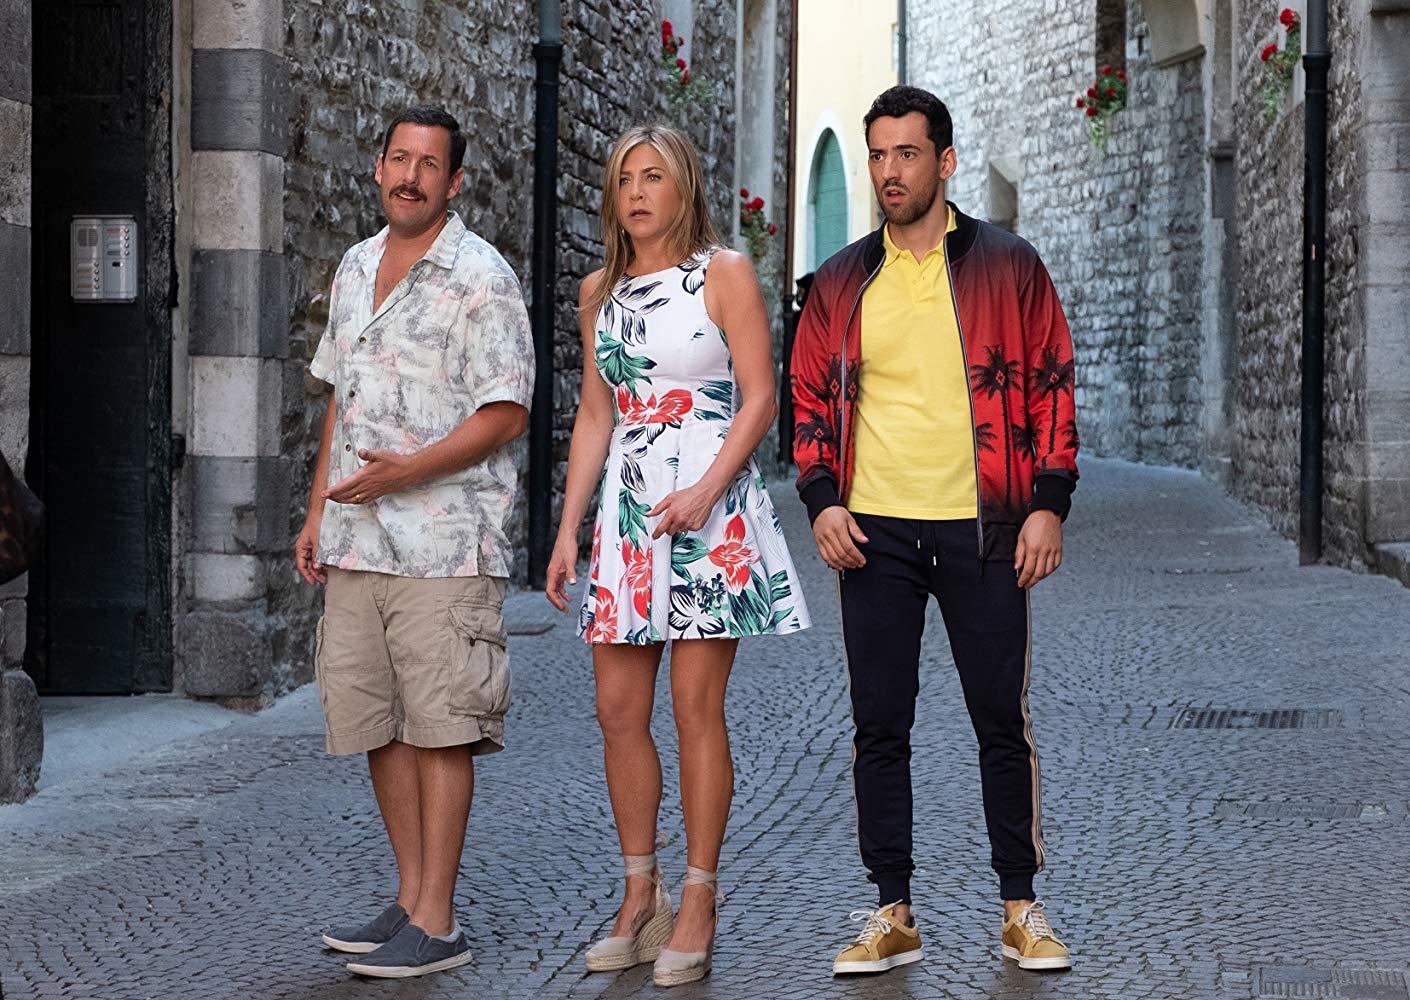 Murder Mystery de Netflix libera avance con Jennifer Aniston y Adam Sandler de cara a estreno